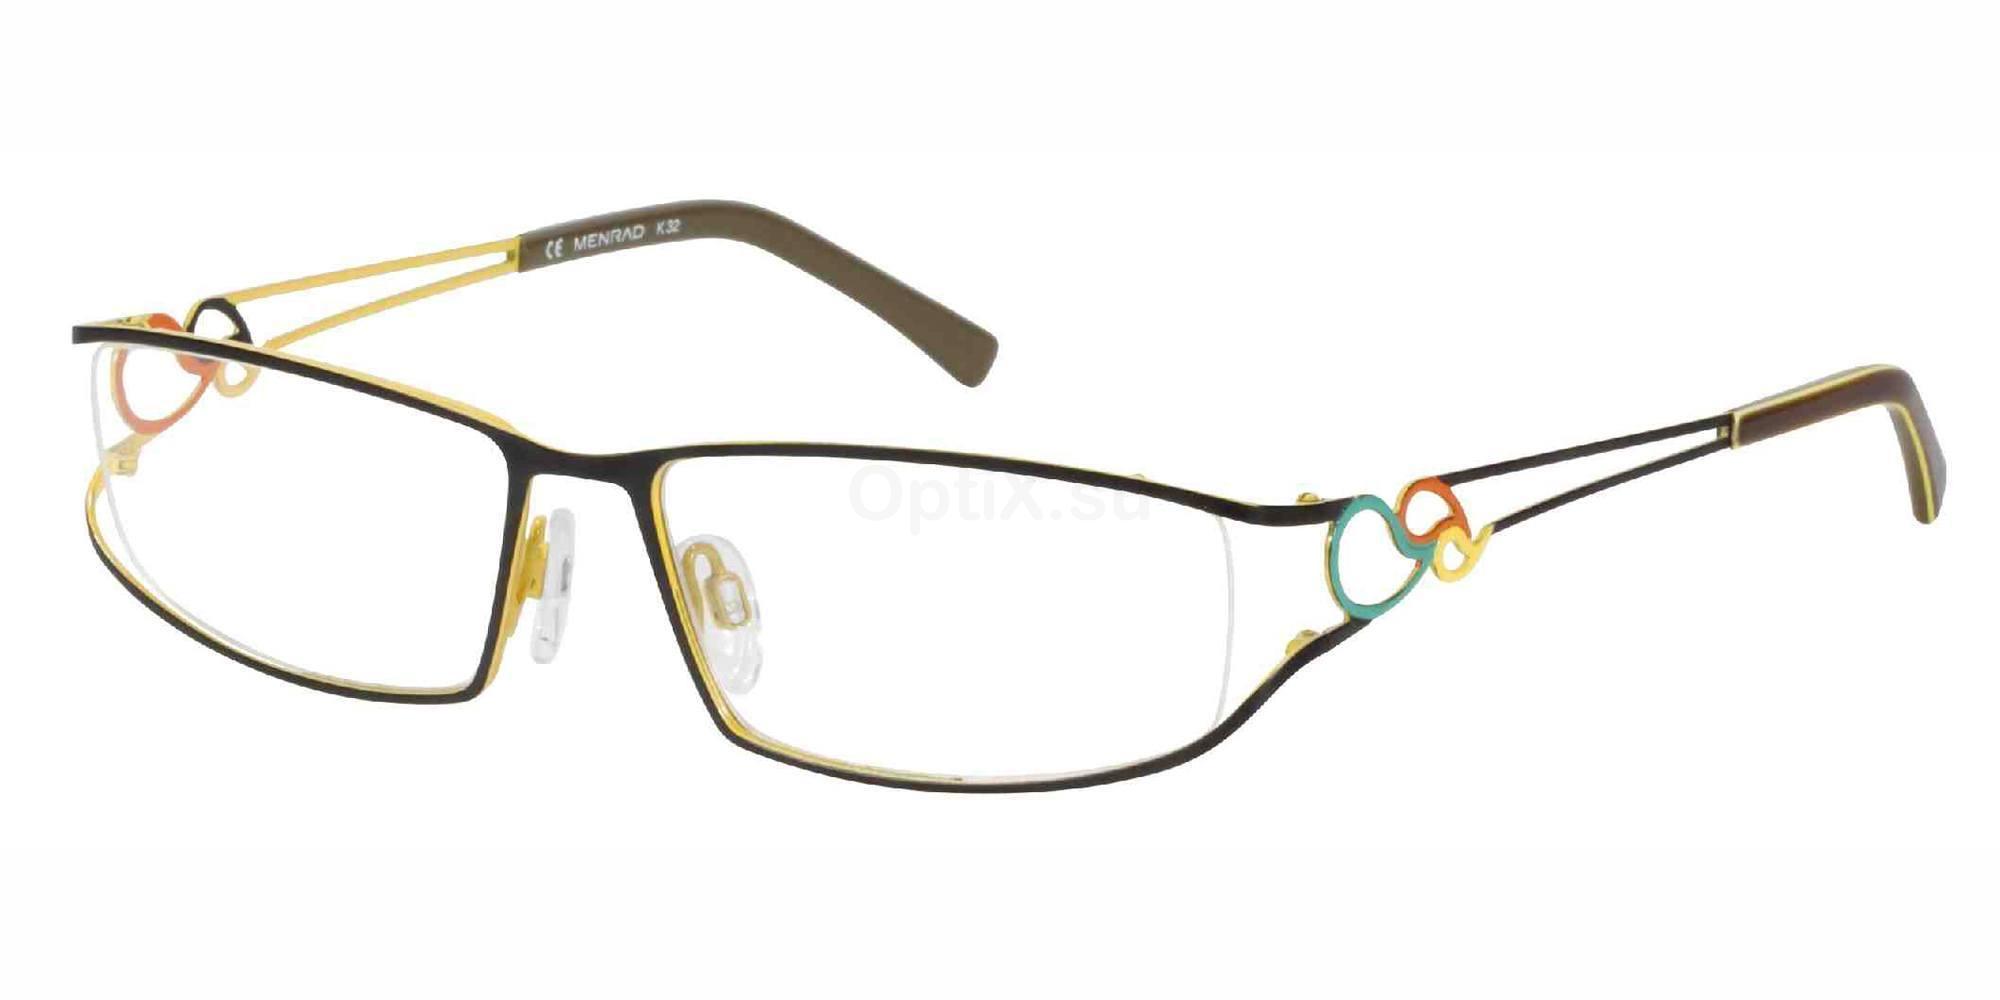 1512 13227 , MENRAD Eyewear